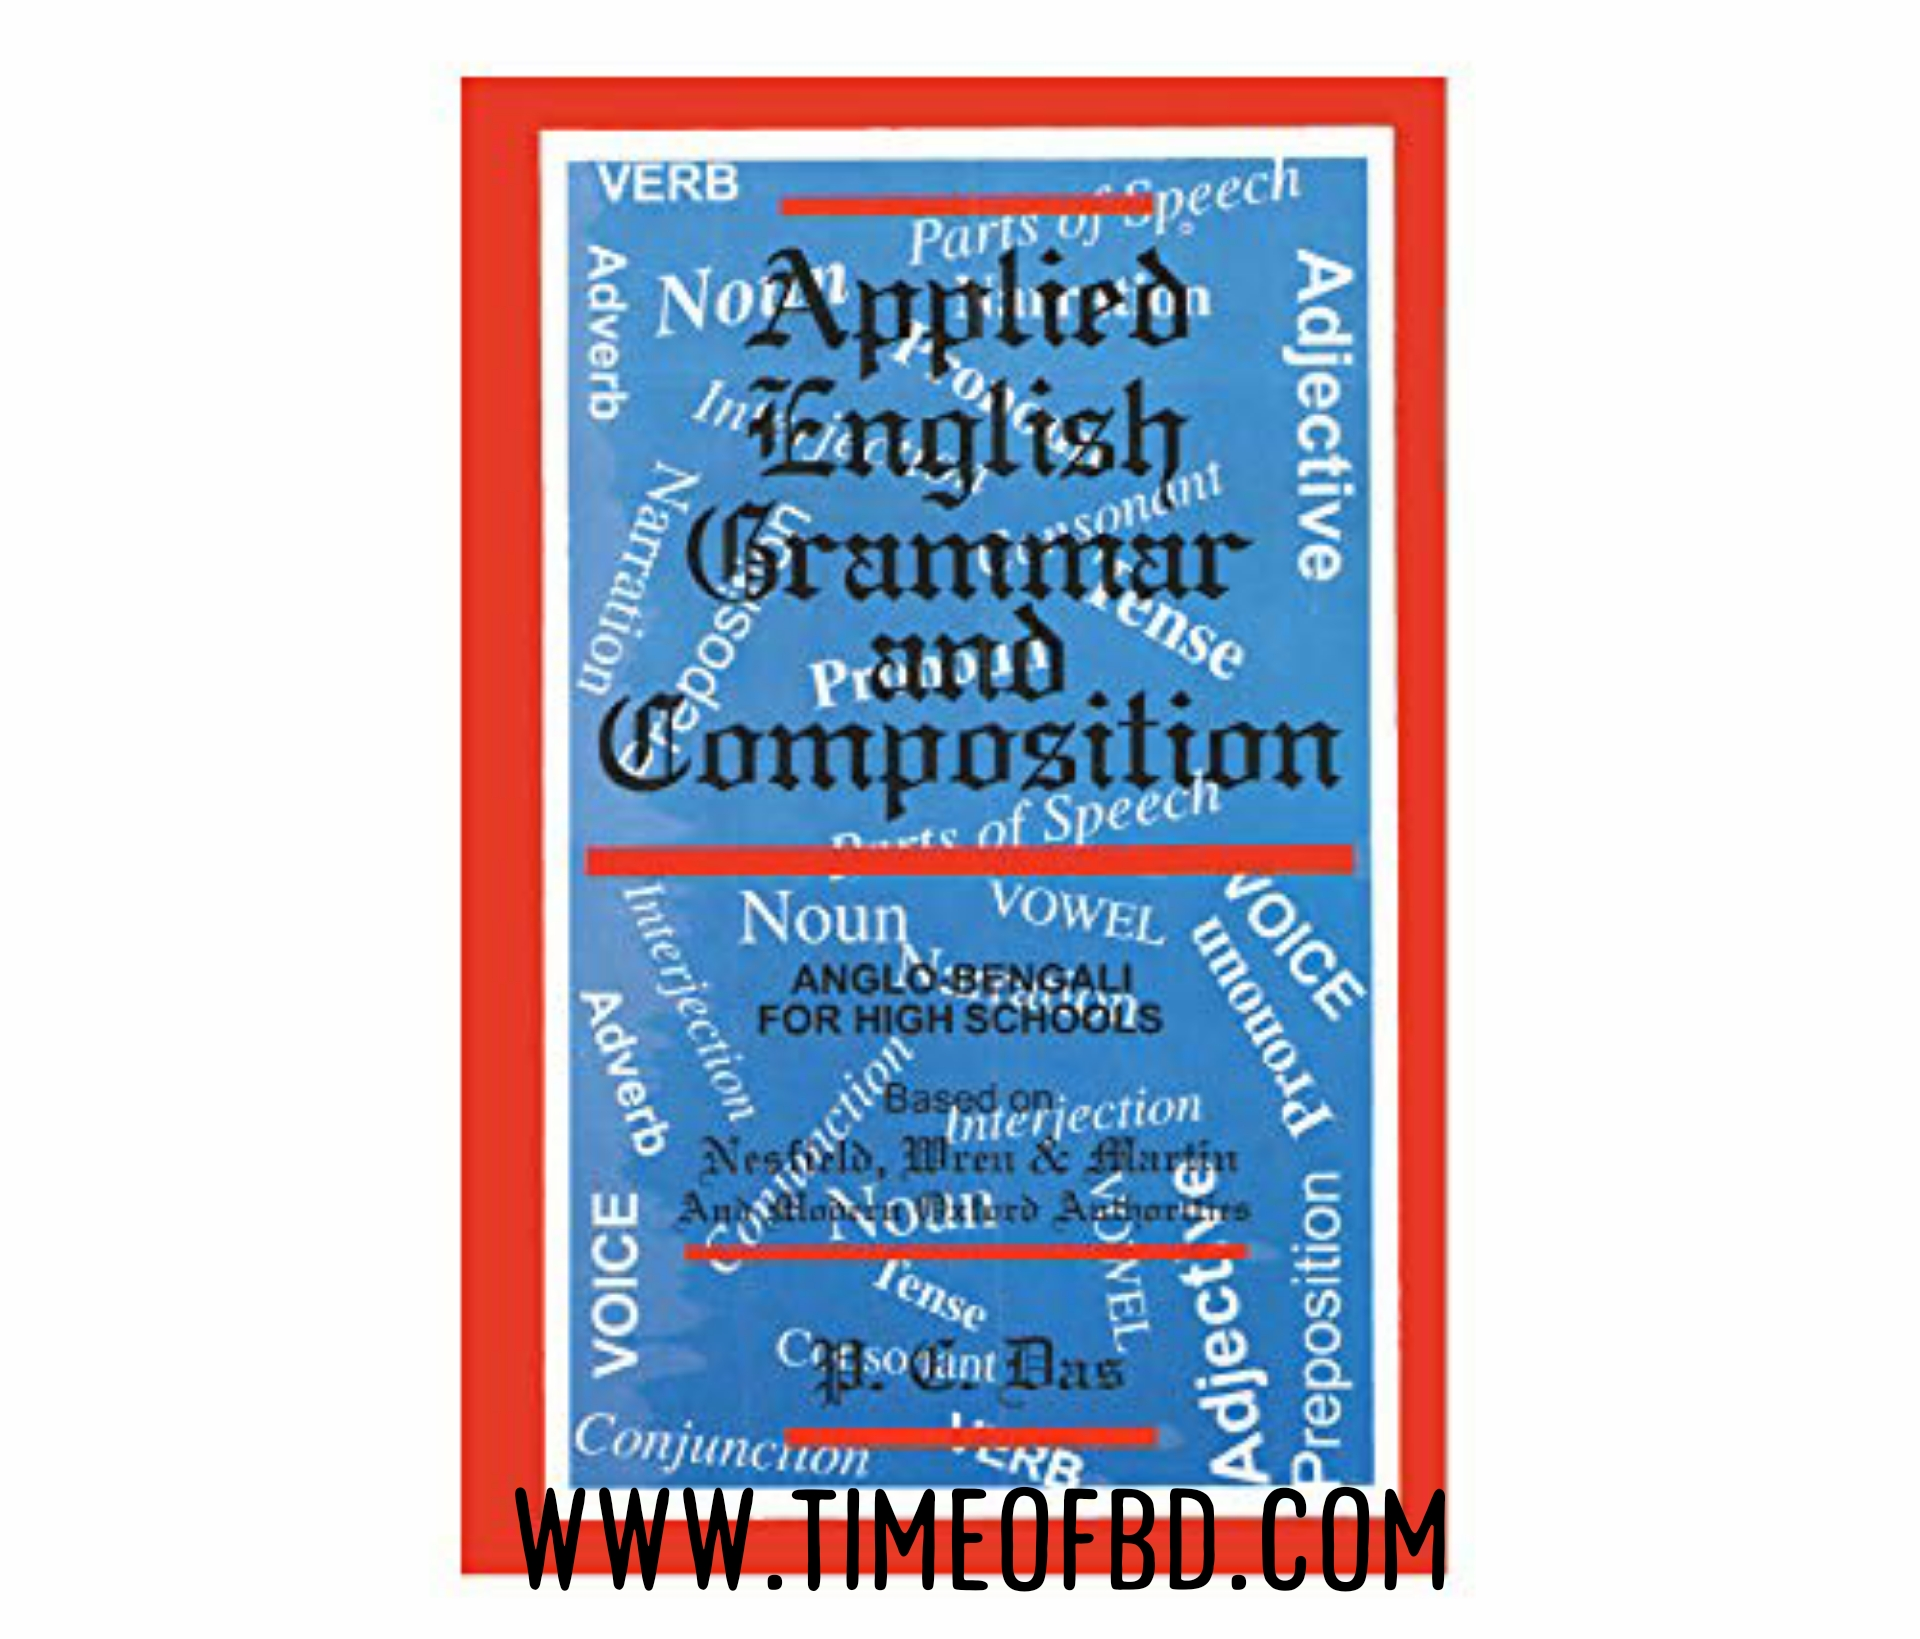 Pc das english grammer book price in Bangladesh, Pc das english grammer book pdf download, Pc das english grammer book online order link, Pc das english grammer book price.